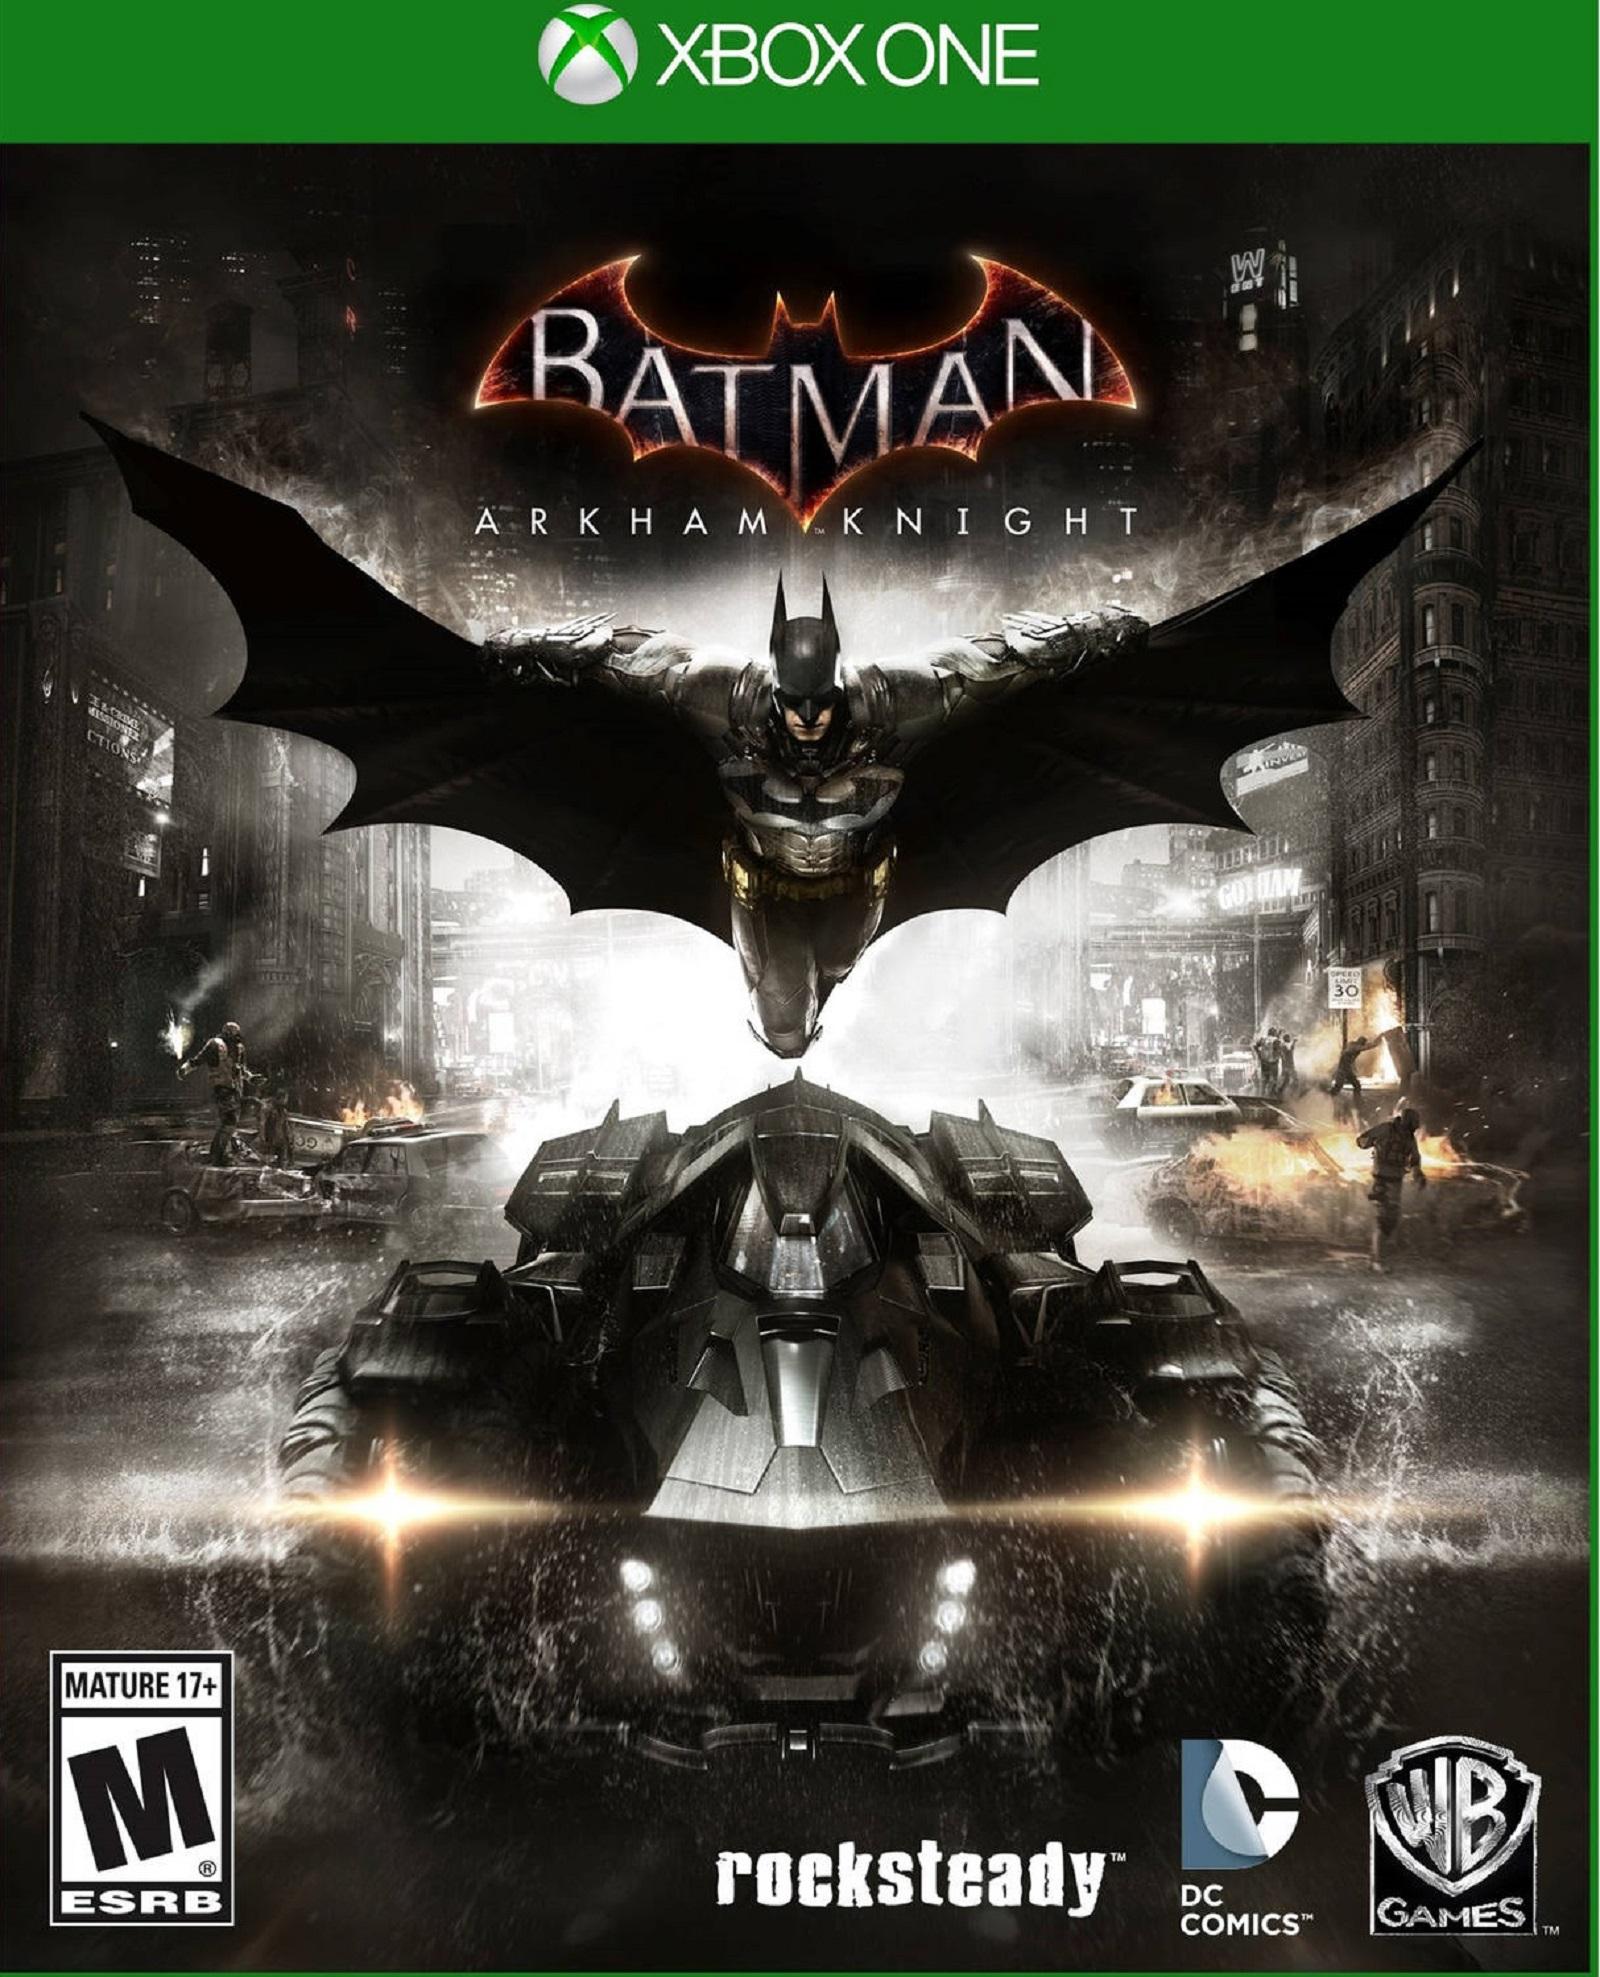 Xbox 360 mature games list